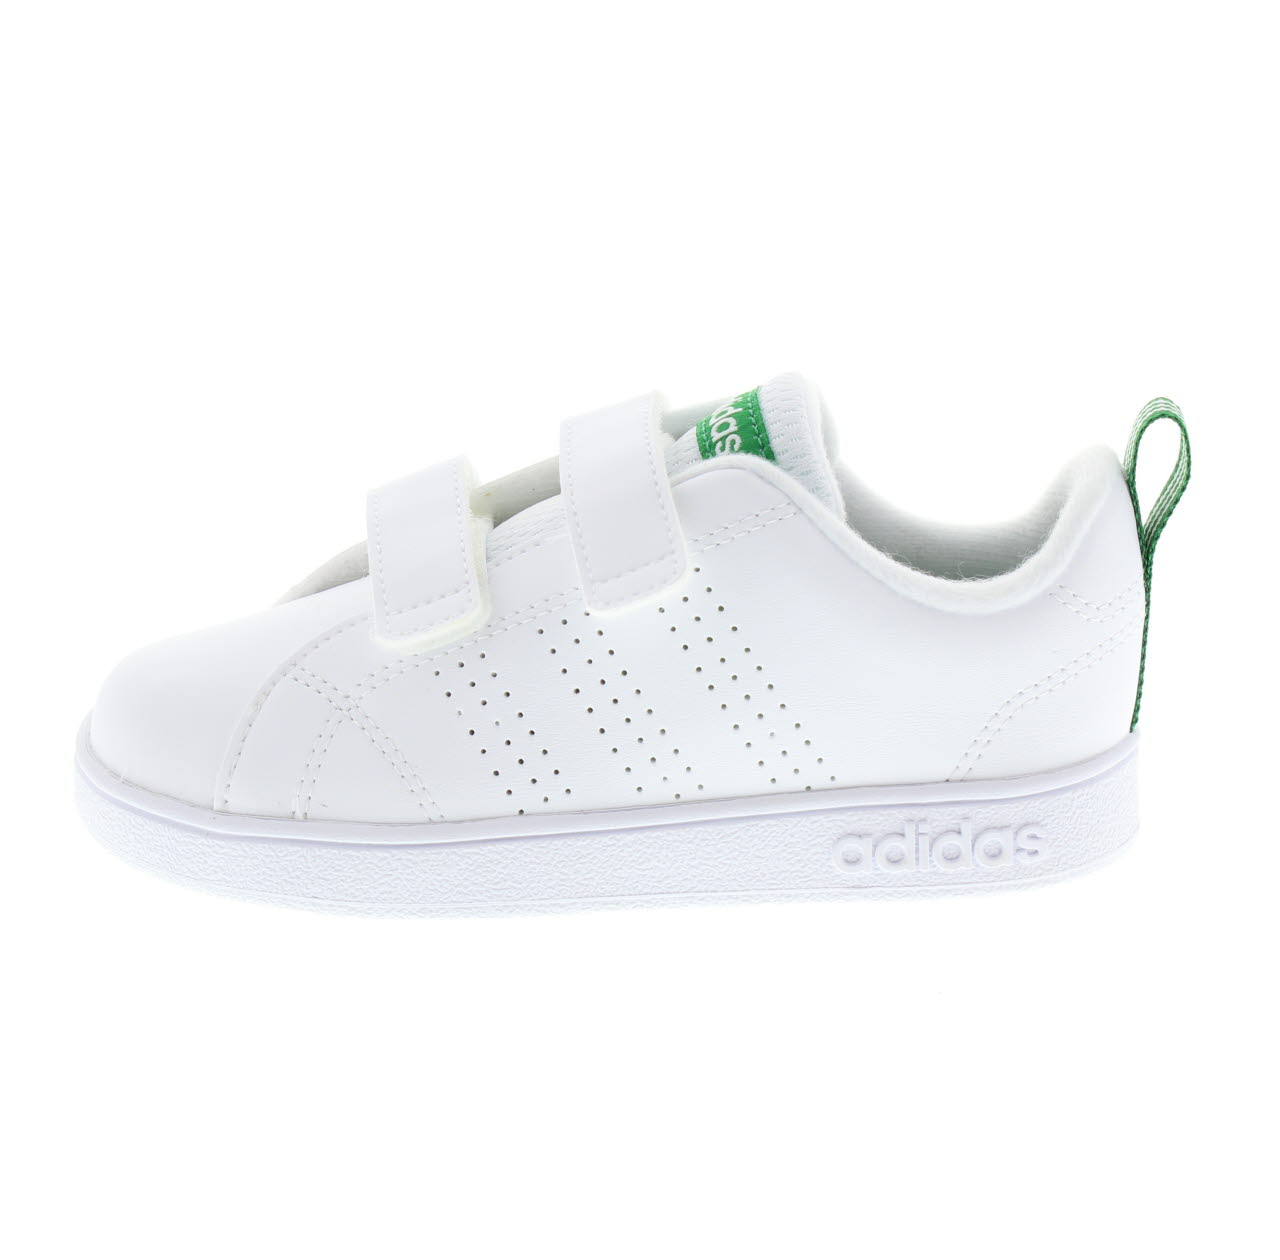 adidas yeezy ultra stimuler les hommes: vêtements mode, adidas neo, converse